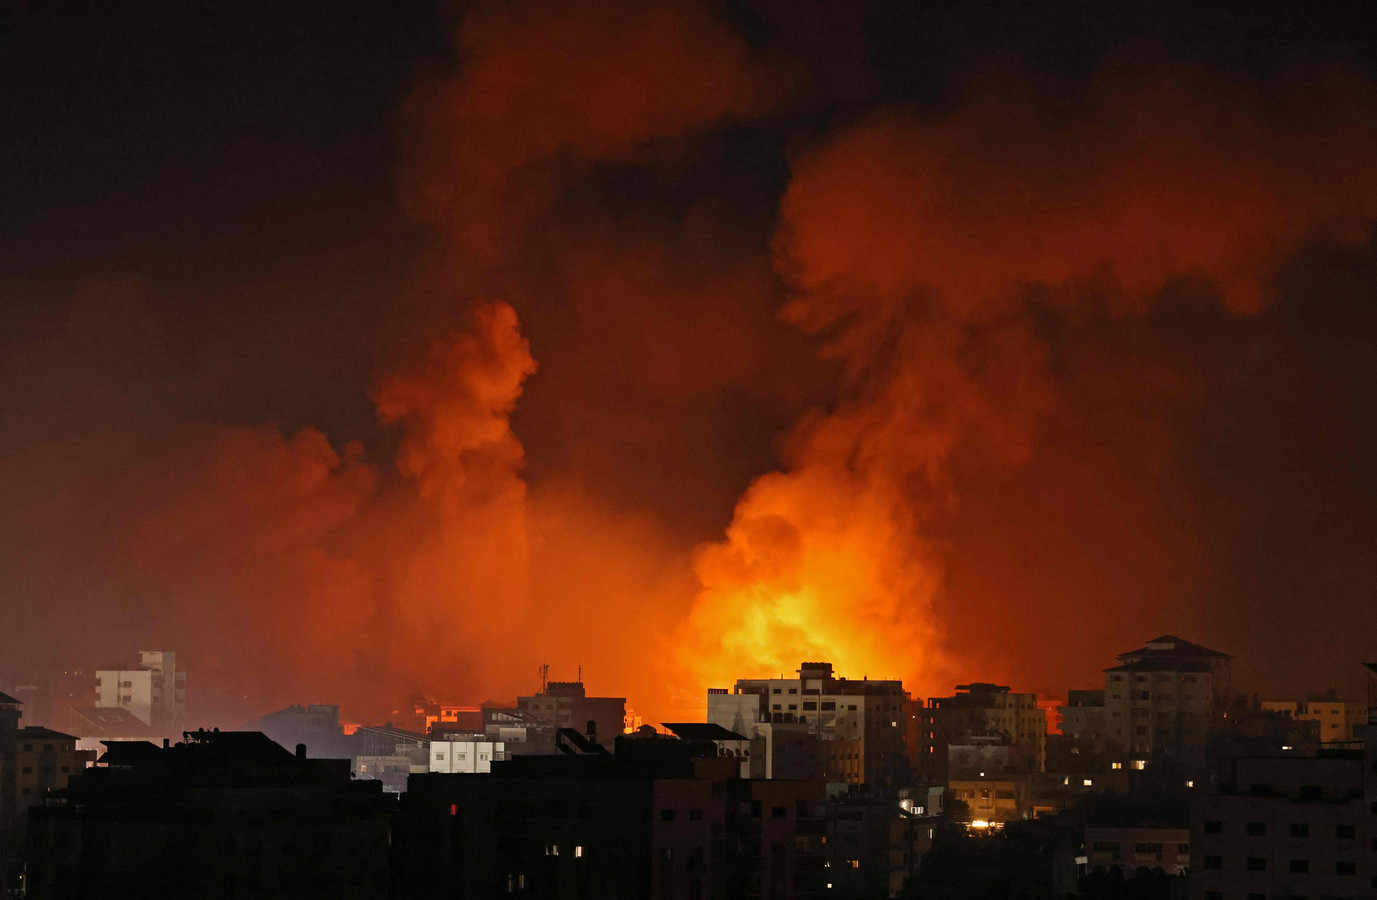 Rookpluimen stijgen op boven Gaza na een Israëlische luchtaanval op Gaza zaterdagnacht.